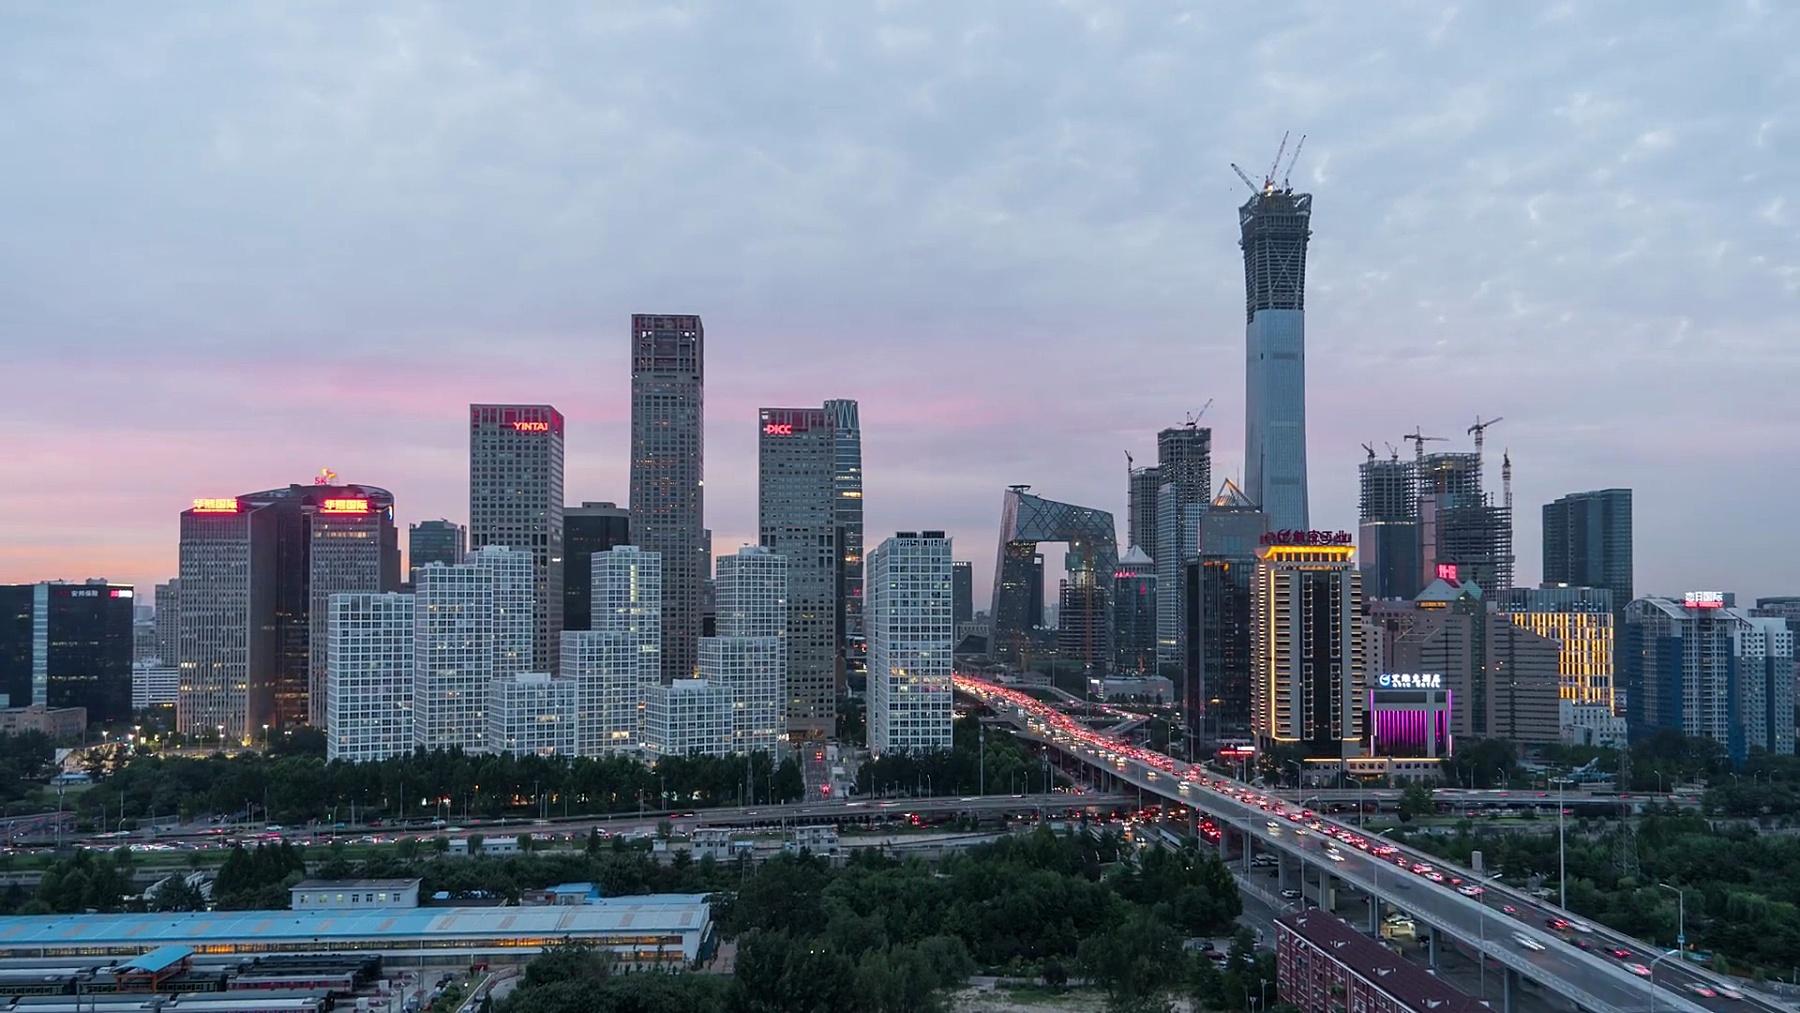 T/L WS ZI北京天际线高架视图,黄昏到夜晚